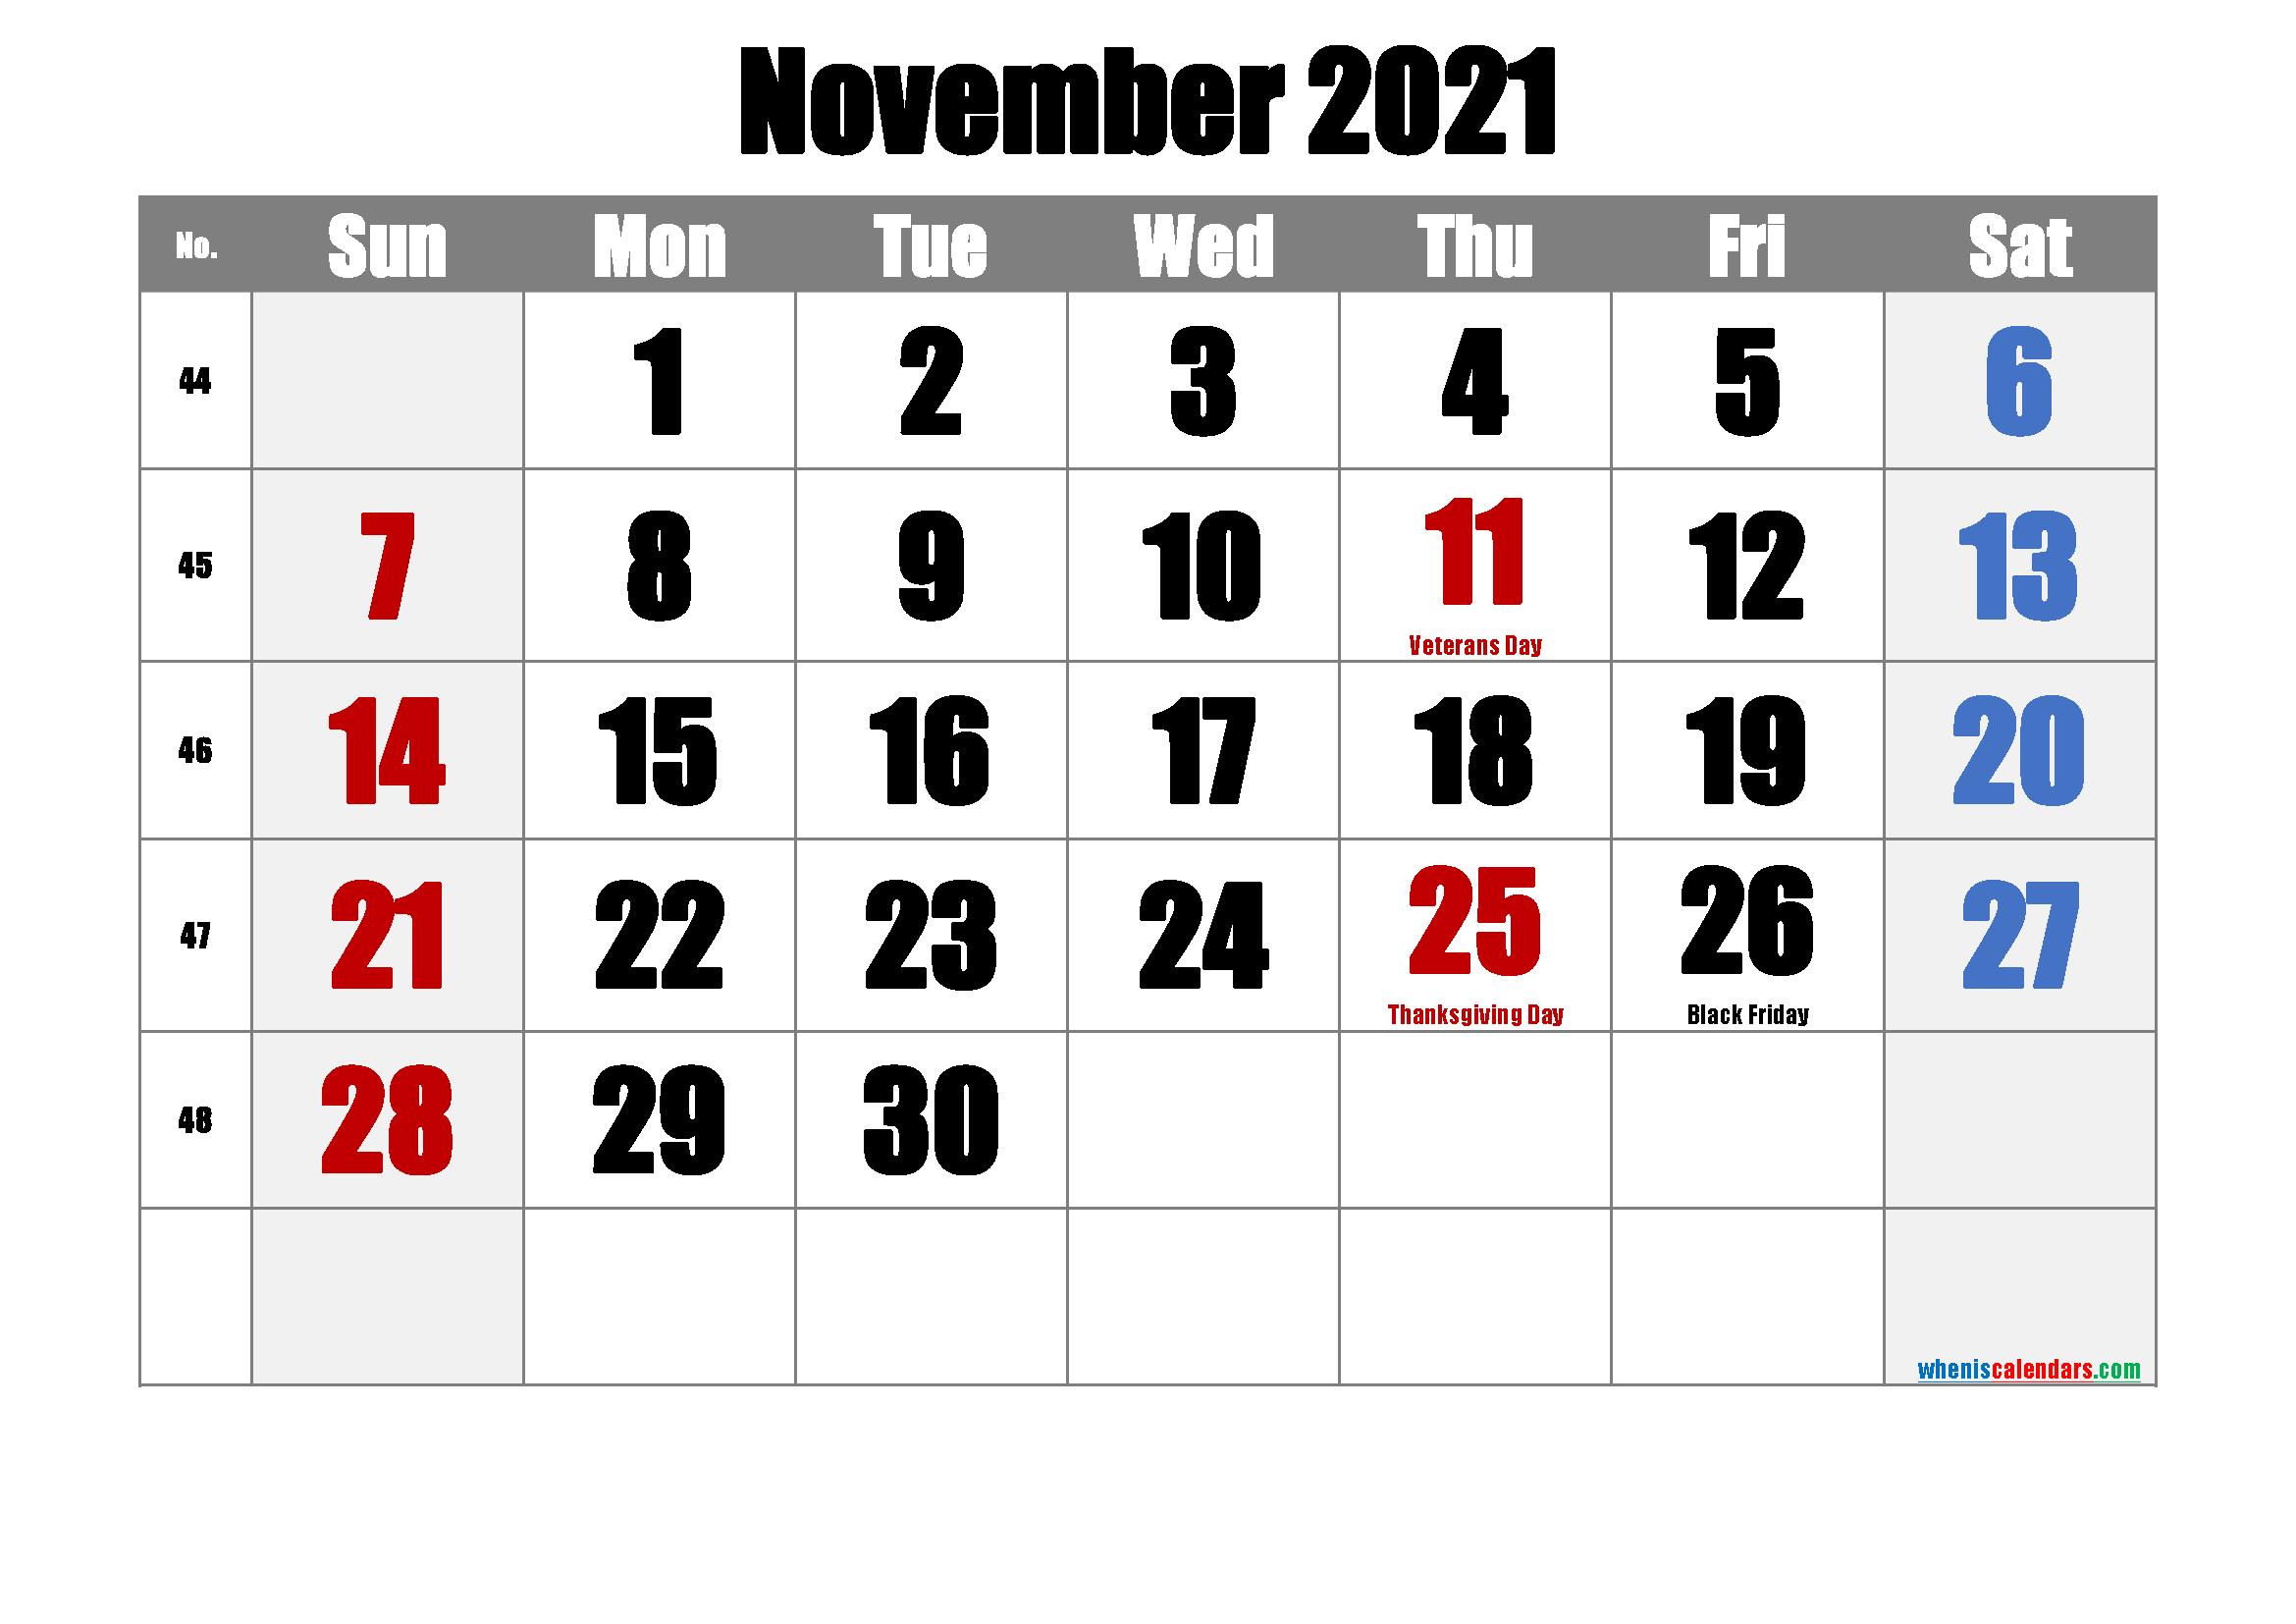 November 2021 Printable Calendar With Holidays